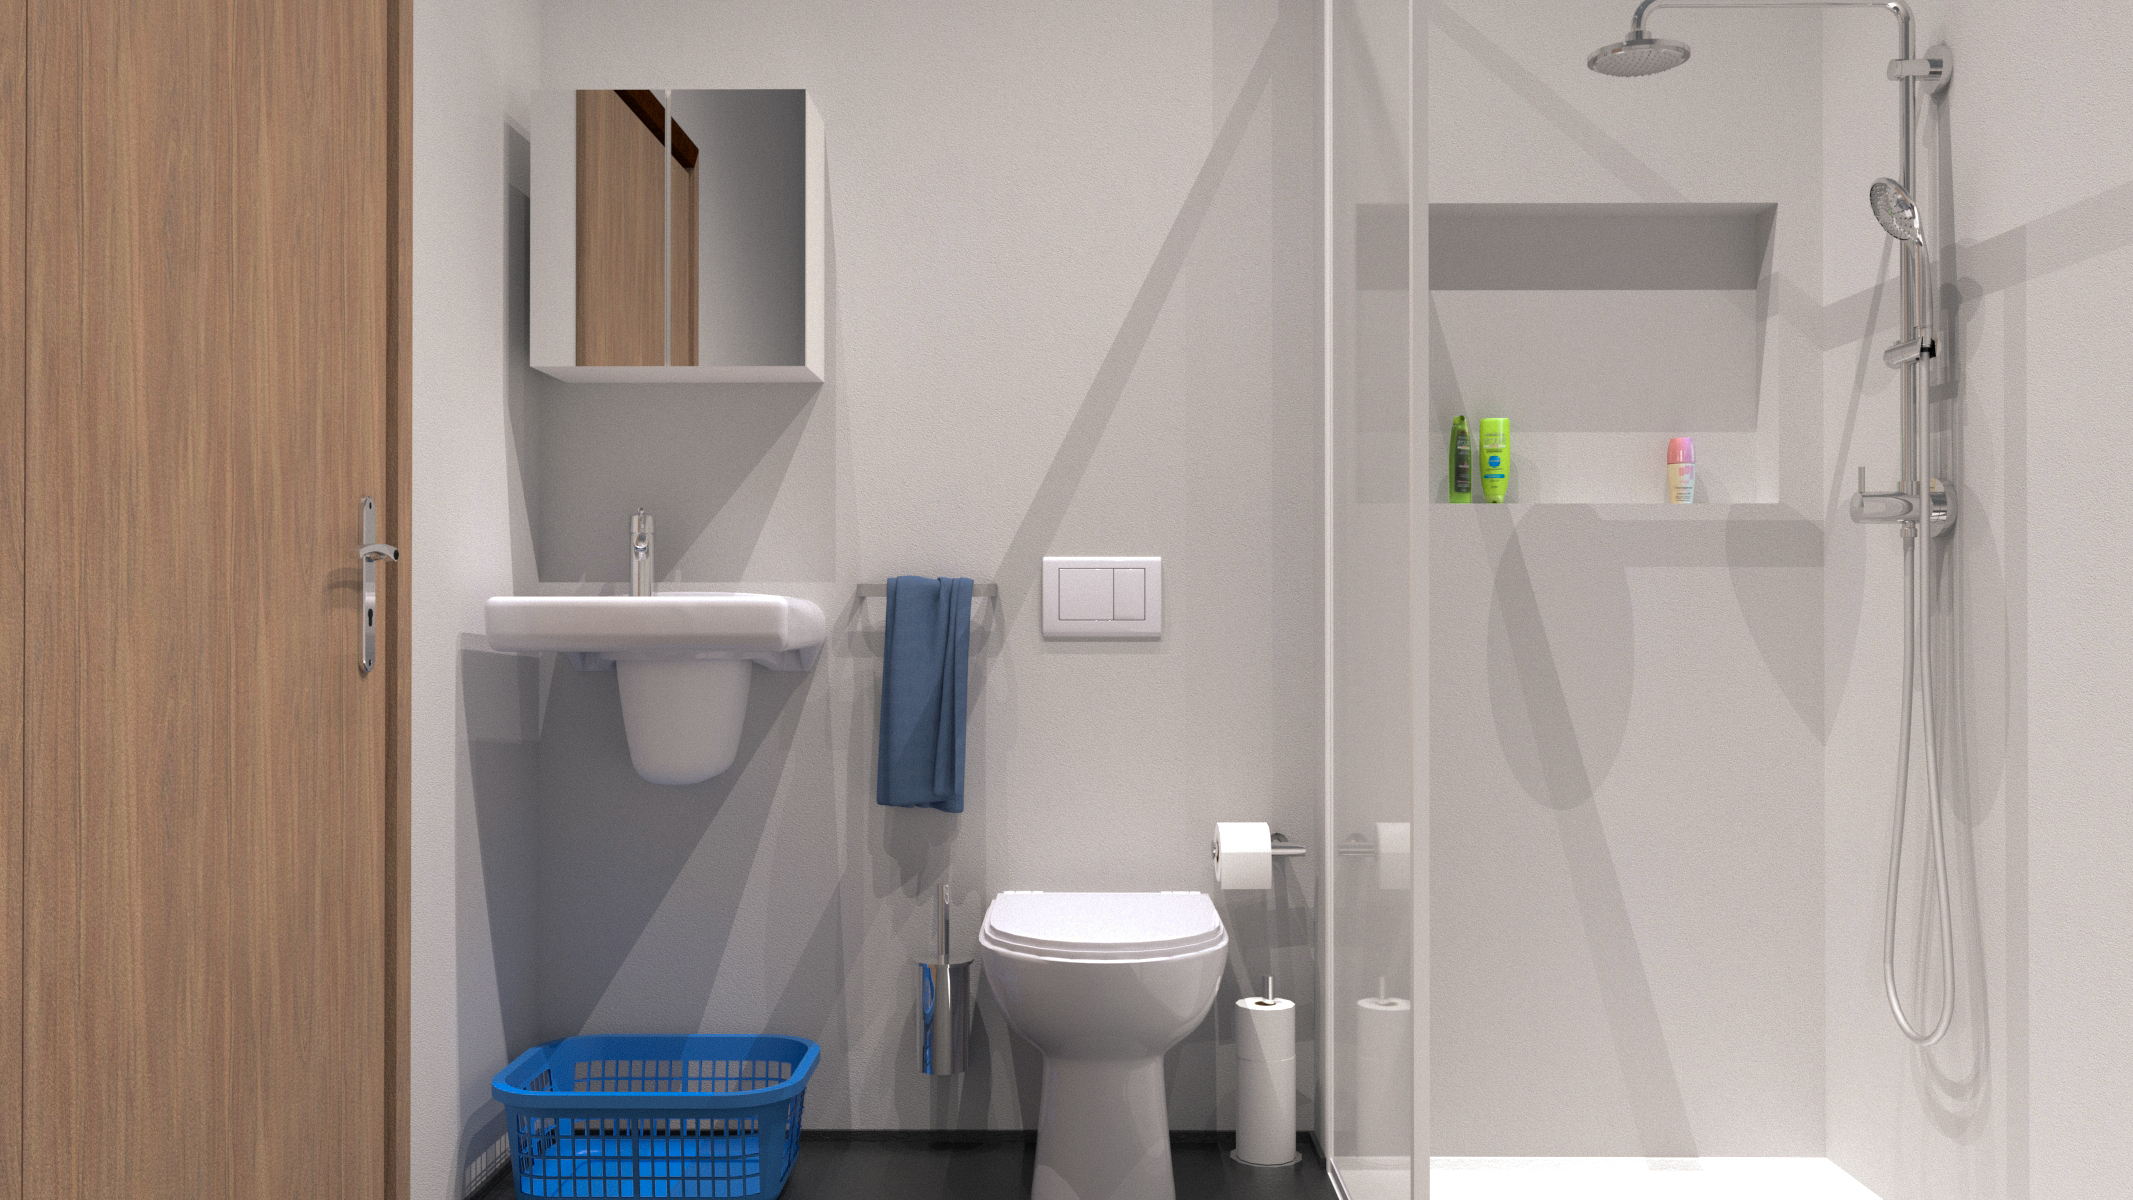 3 badkamer - Syus.be